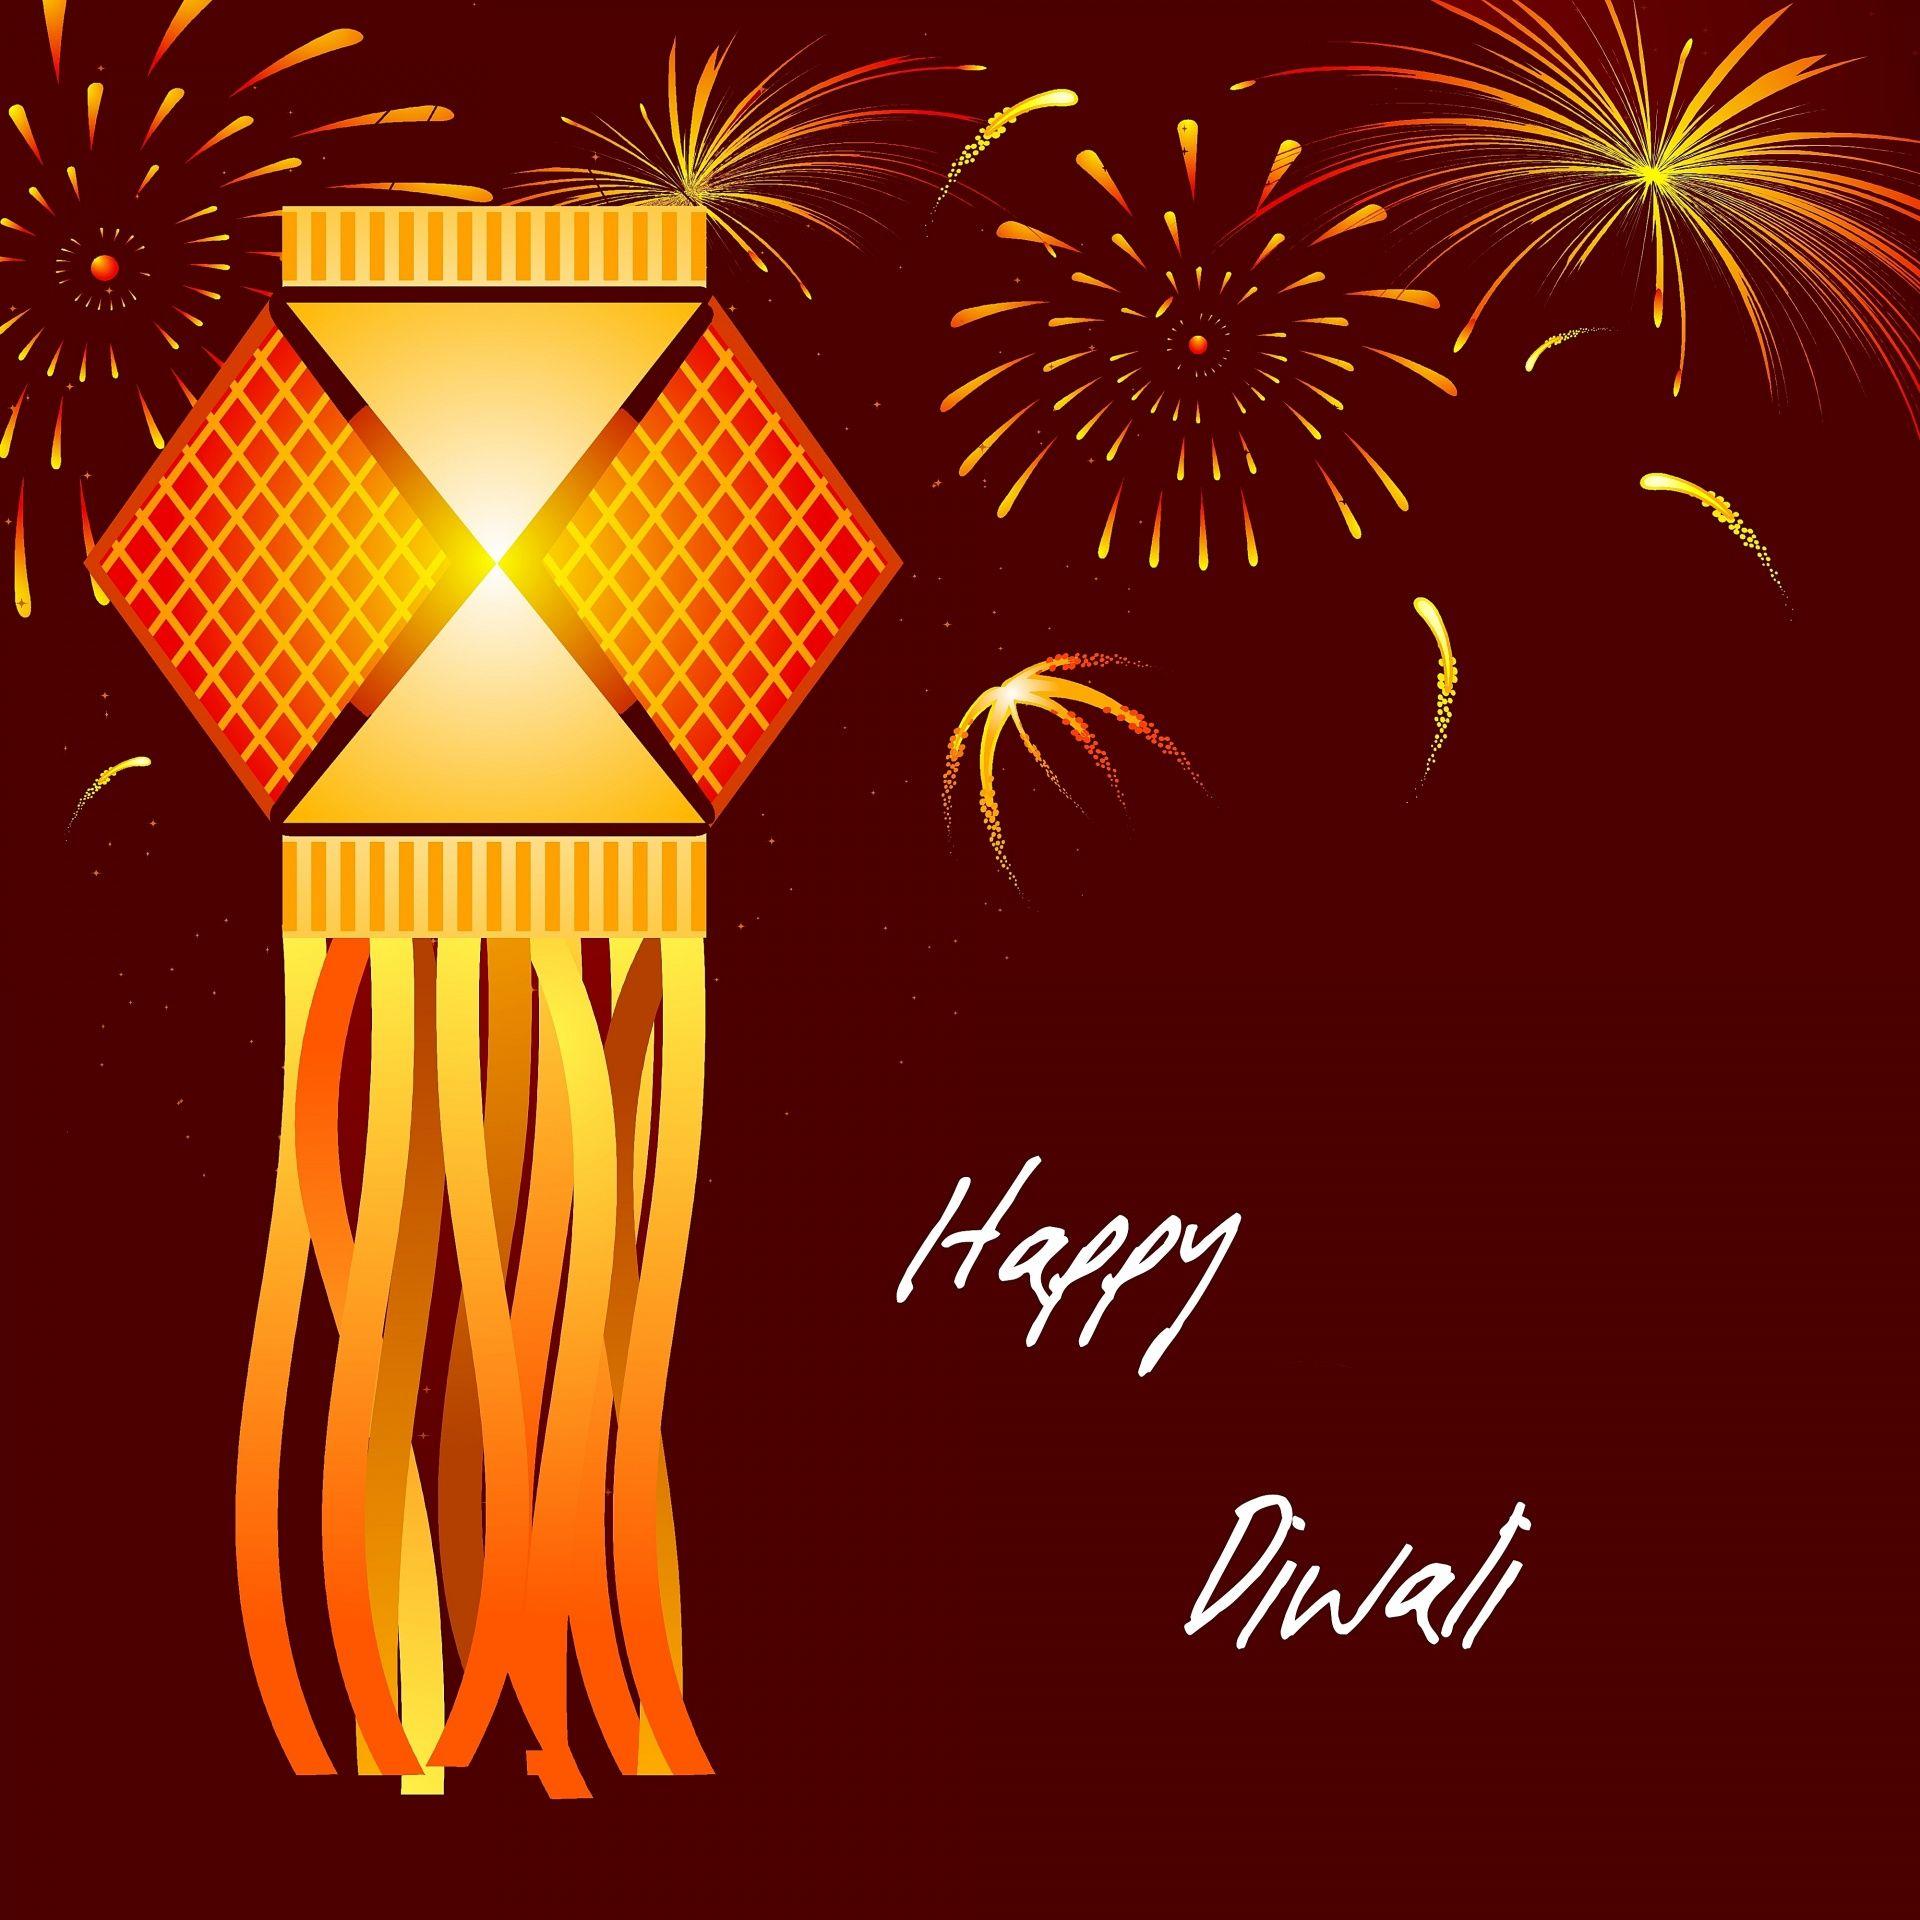 happy diwali images 2018 diwali hd images happy diwali quotes happy diwali status happy diwali wishes happy diwali messages